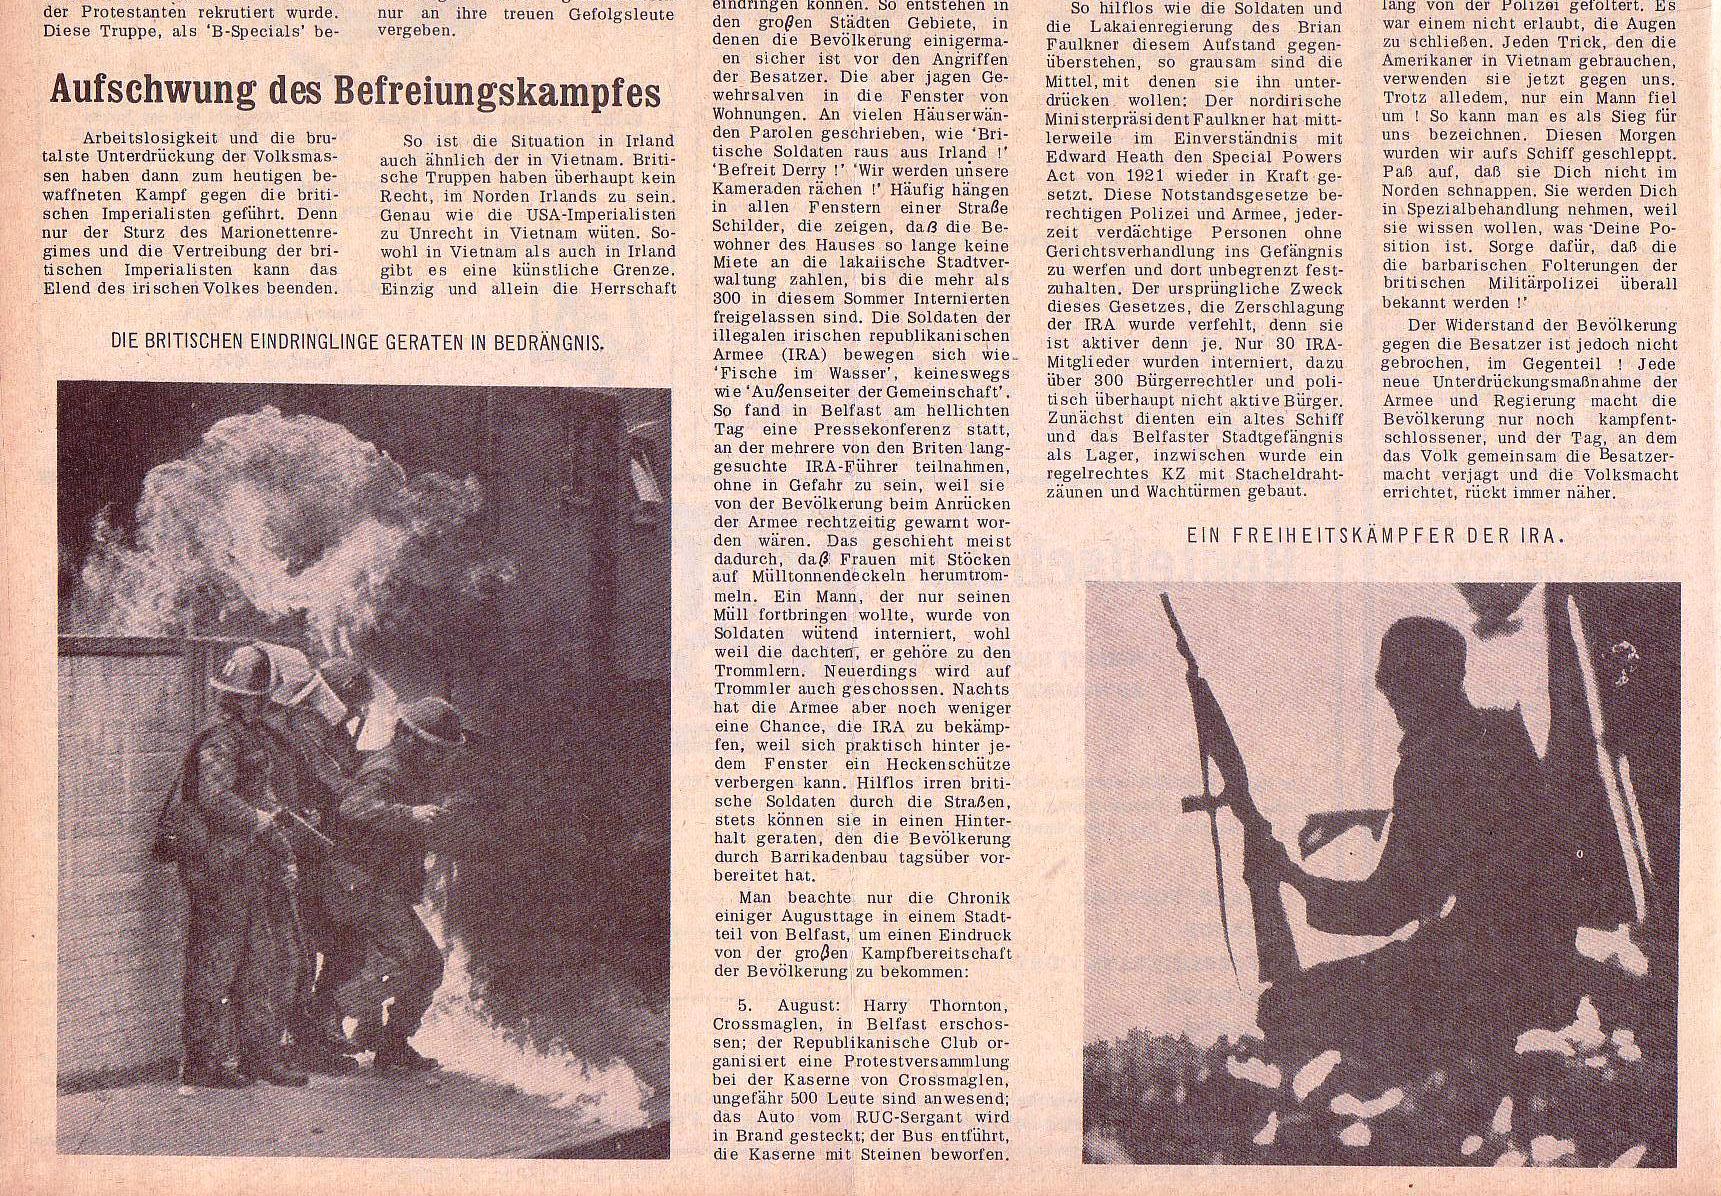 Roter Morgen, 5. Jg., 22. November 1971, Nr. 14, Seite 8b